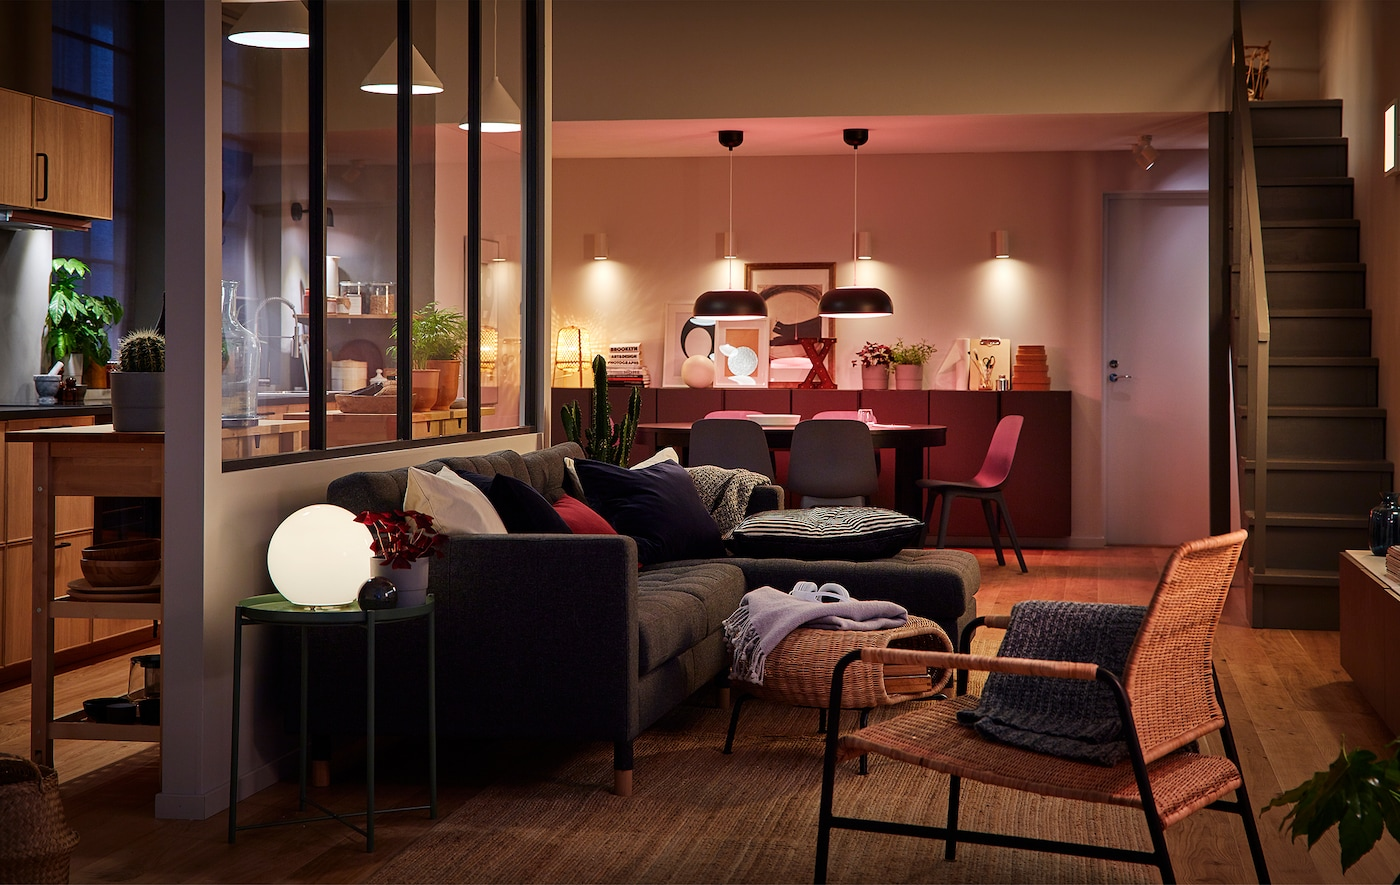 mood lighting your home with led ikea